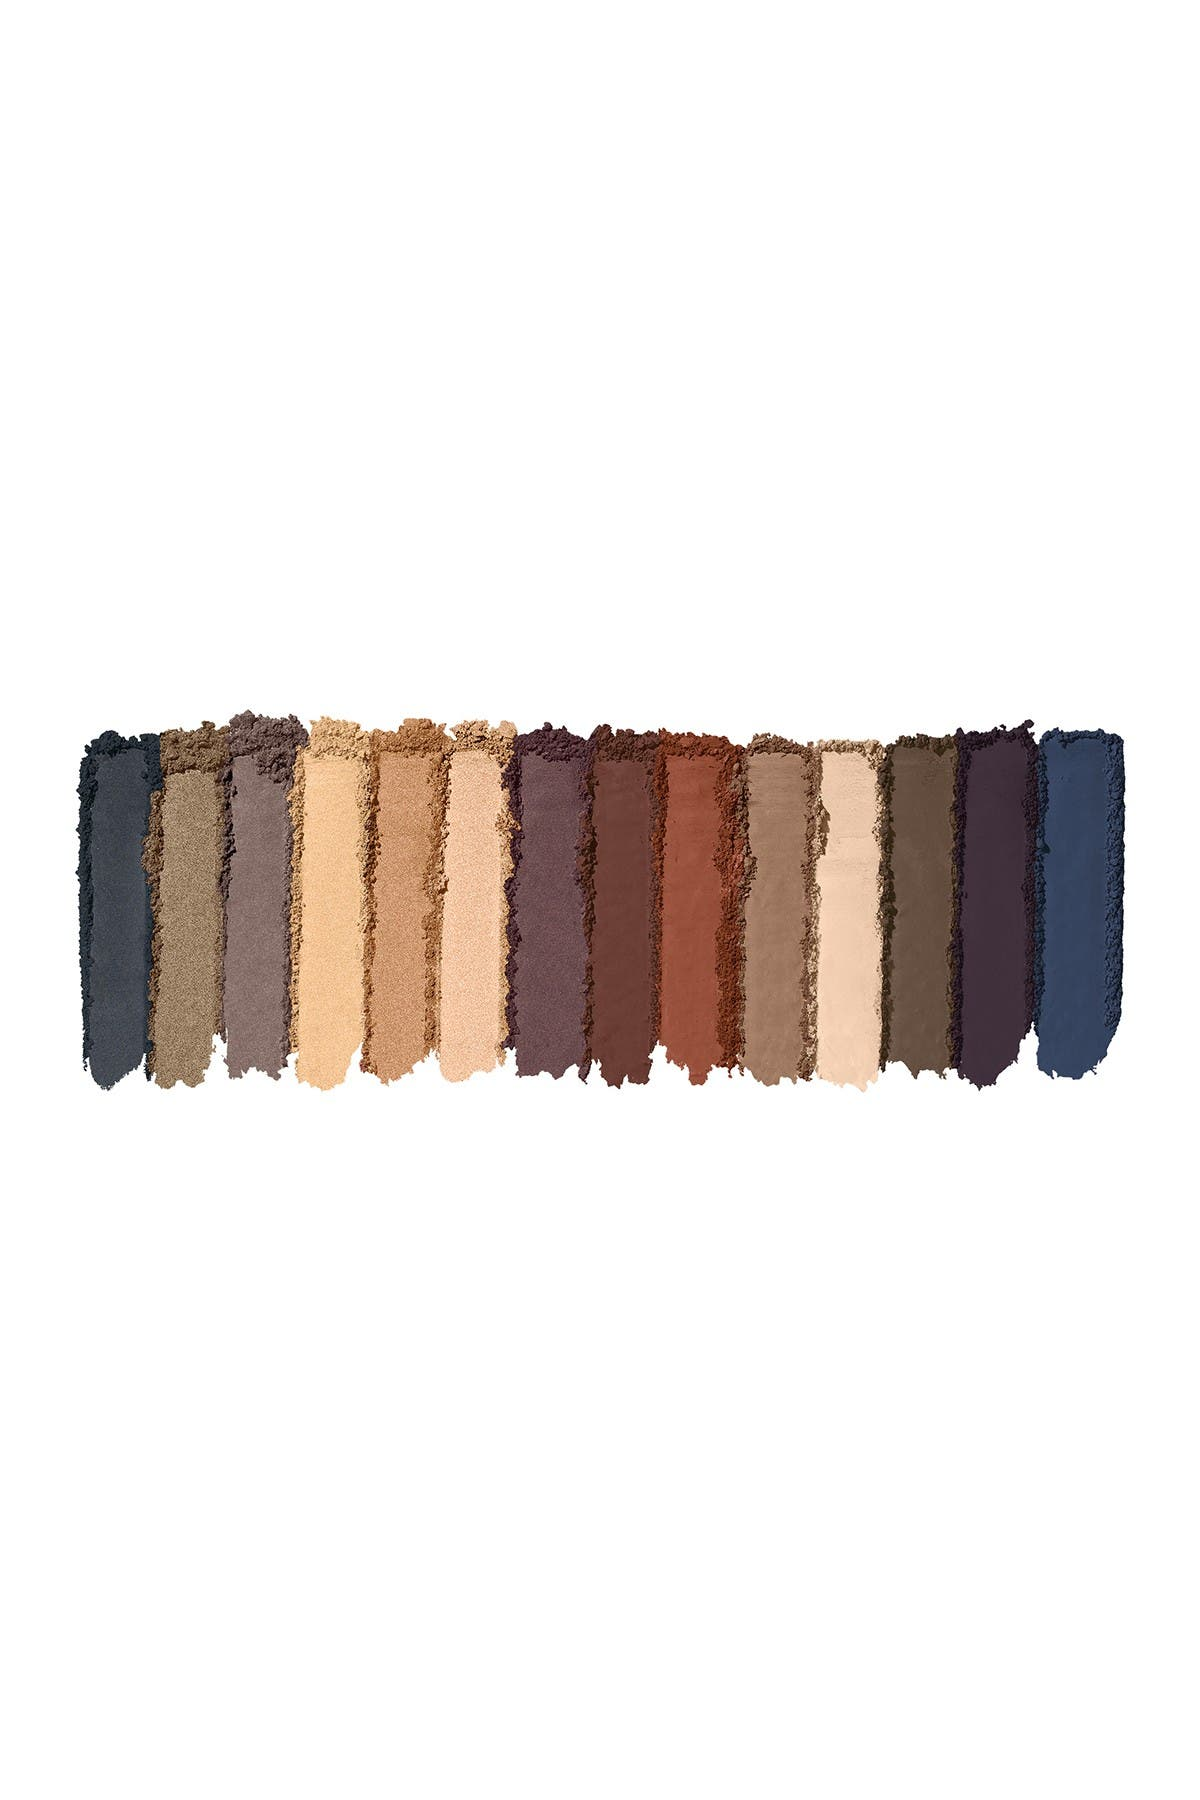 Image of Smashbox Double Exposure 2 Eyeshadow Palette